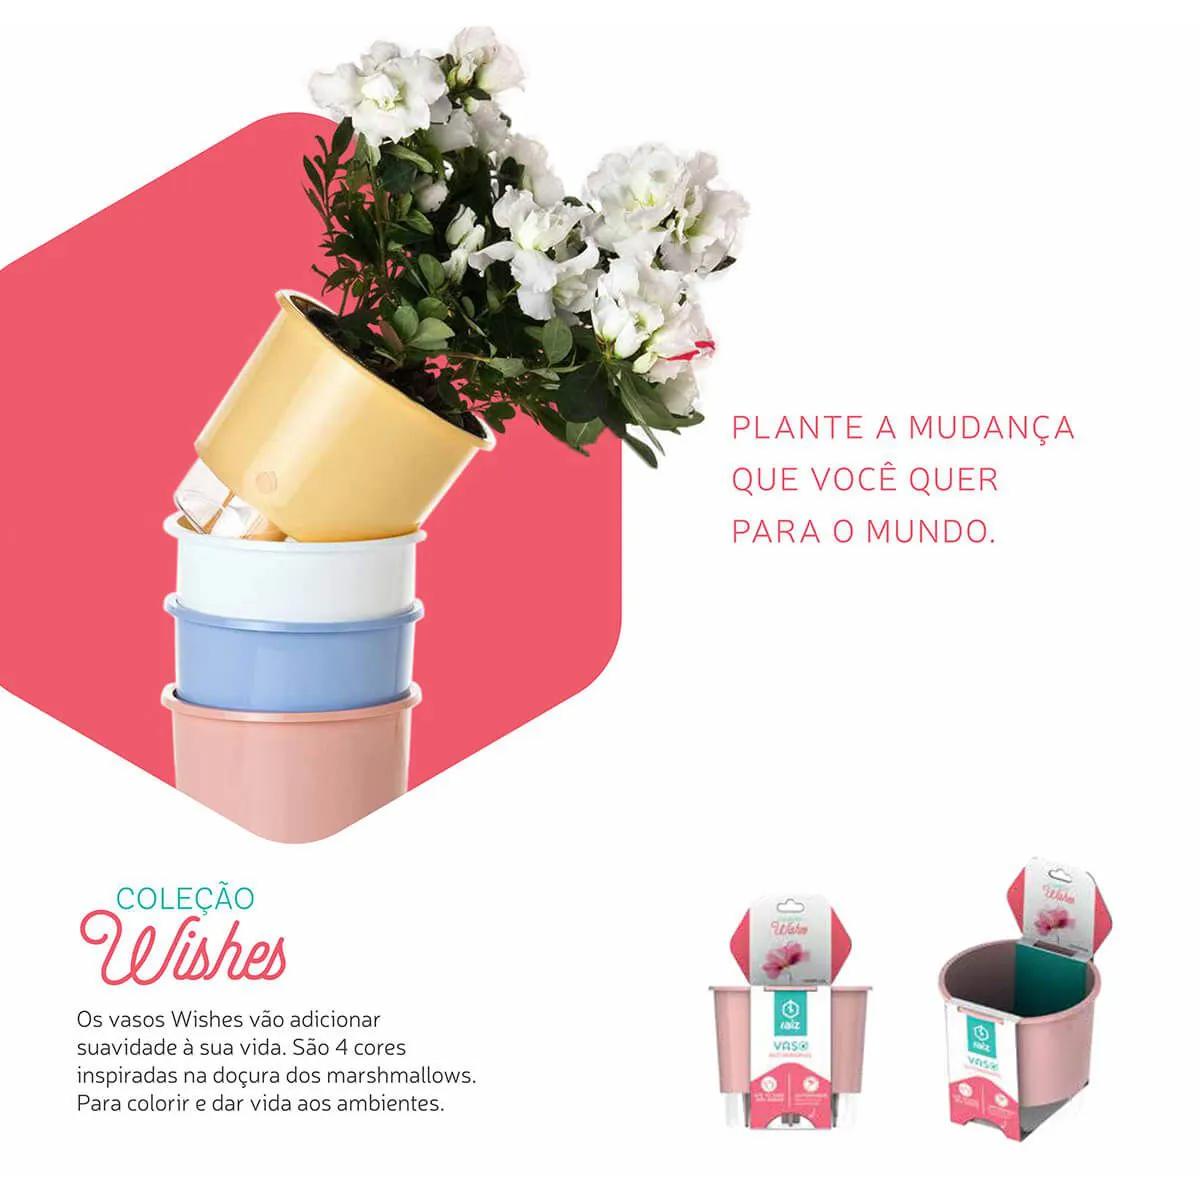 Conjunto 3 Vasos Autoirrigáveis Plante o Bem - Verde Raiz 12cm x 11cm Pequenos N02  - Vasos Raiz Loja Oficial